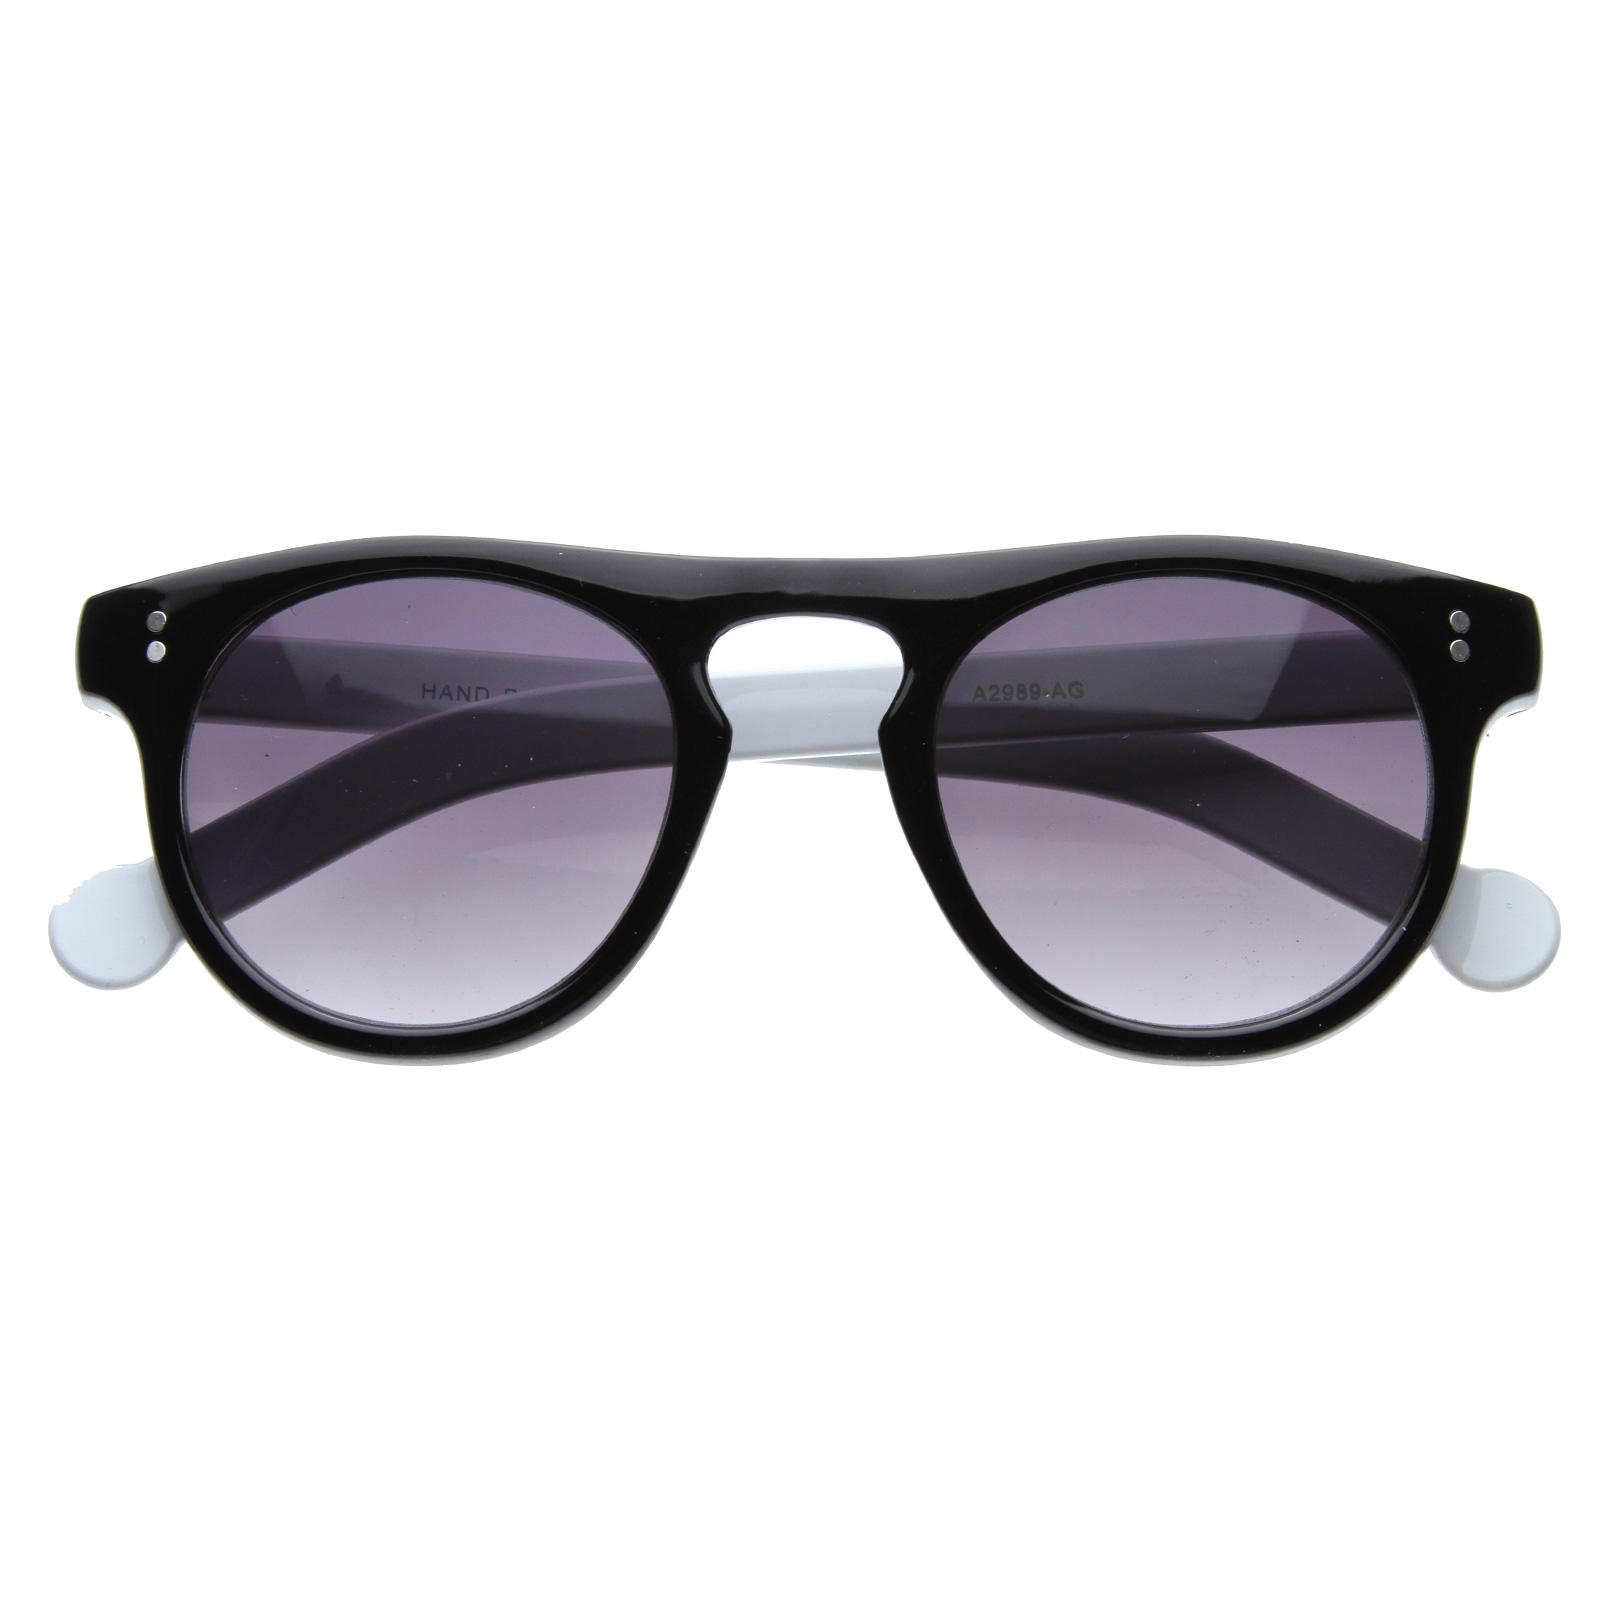 8009fd8535972 Oculos Da Oakley Com Fone De Ouvido « Heritage Malta